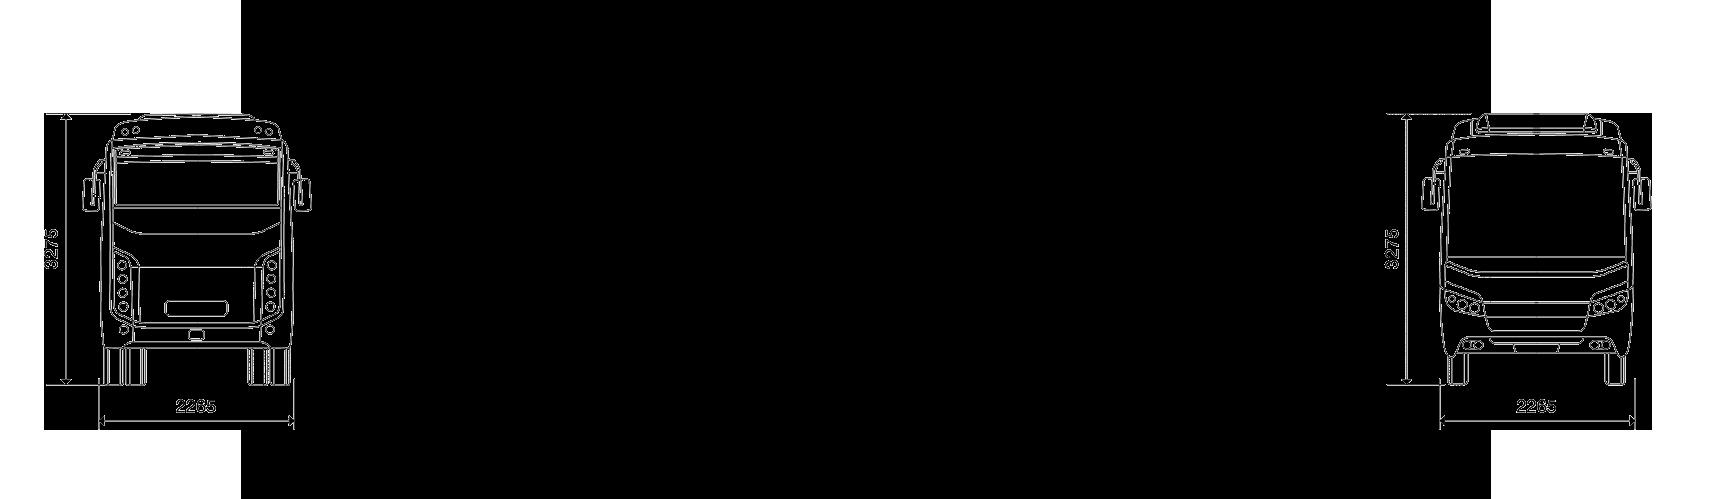 navigo_c_tech